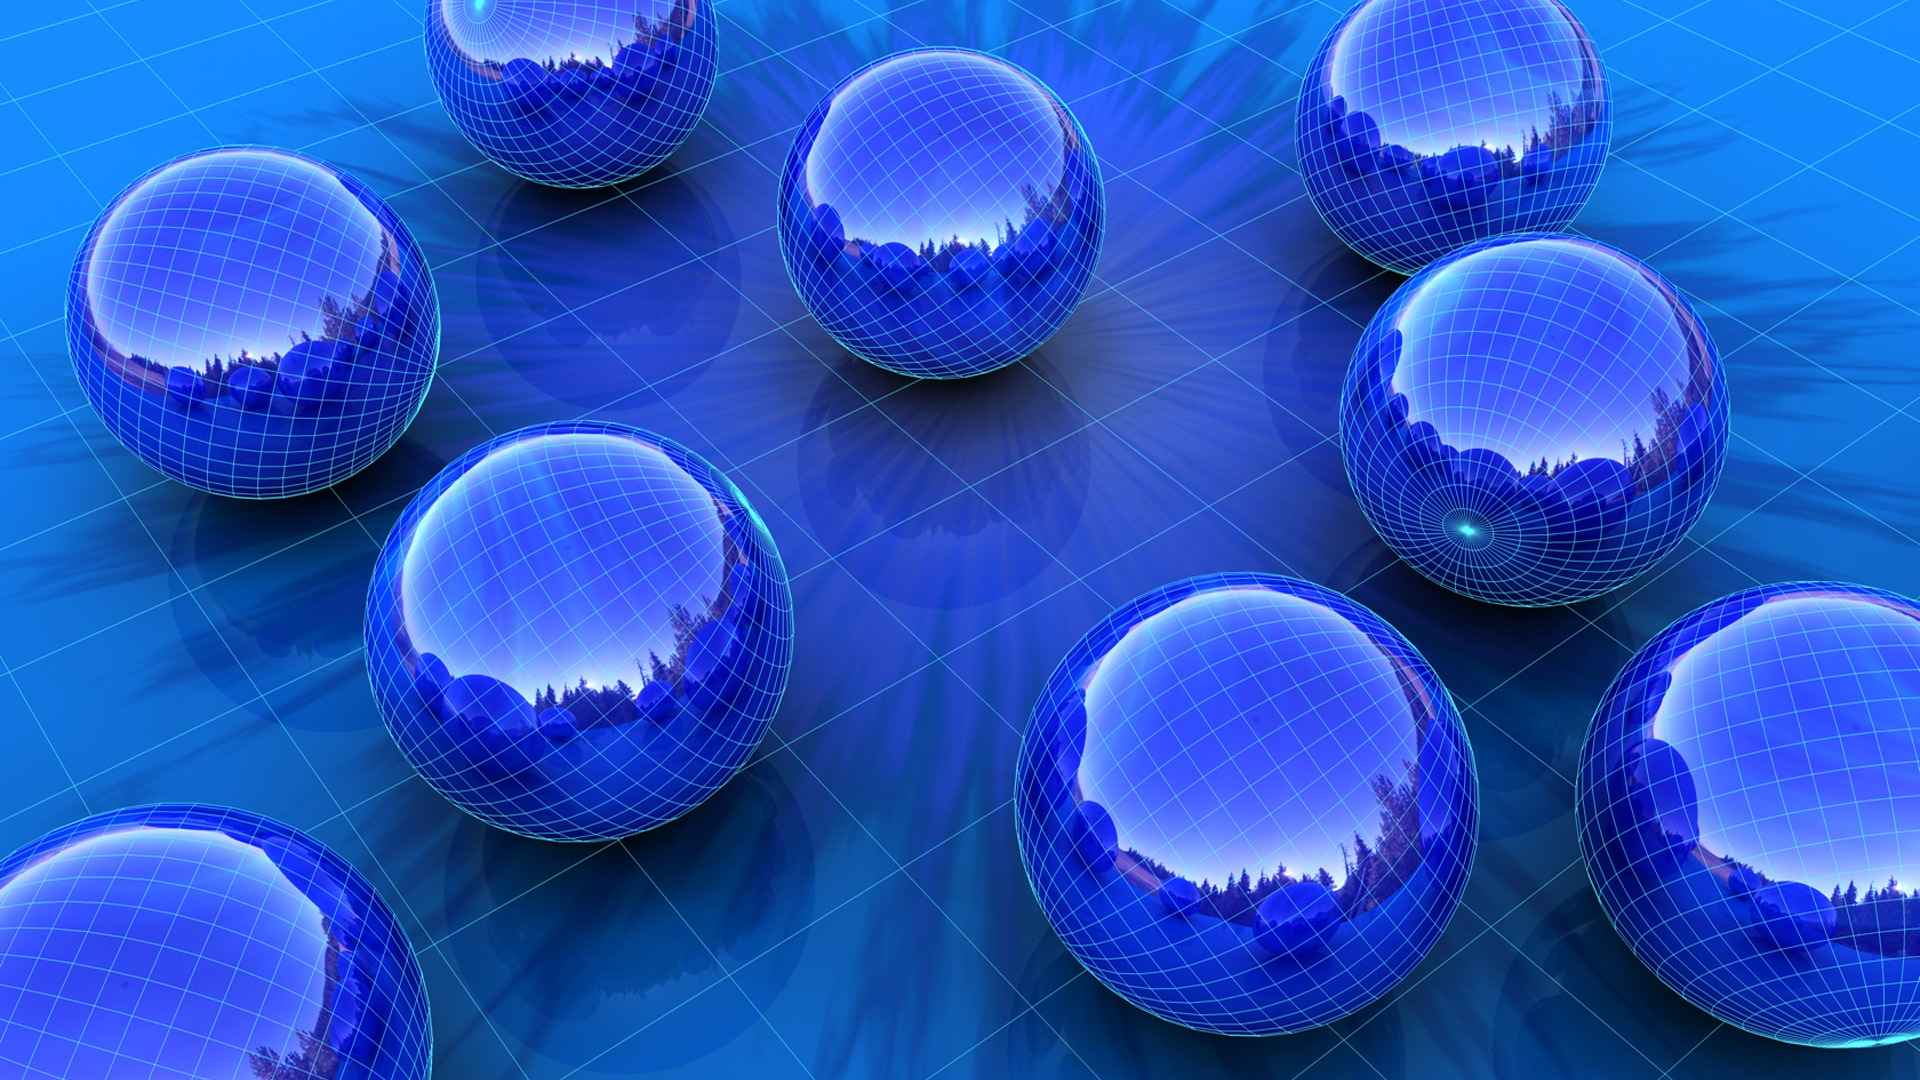 blue 3d spheres desktop wallpaper 61844